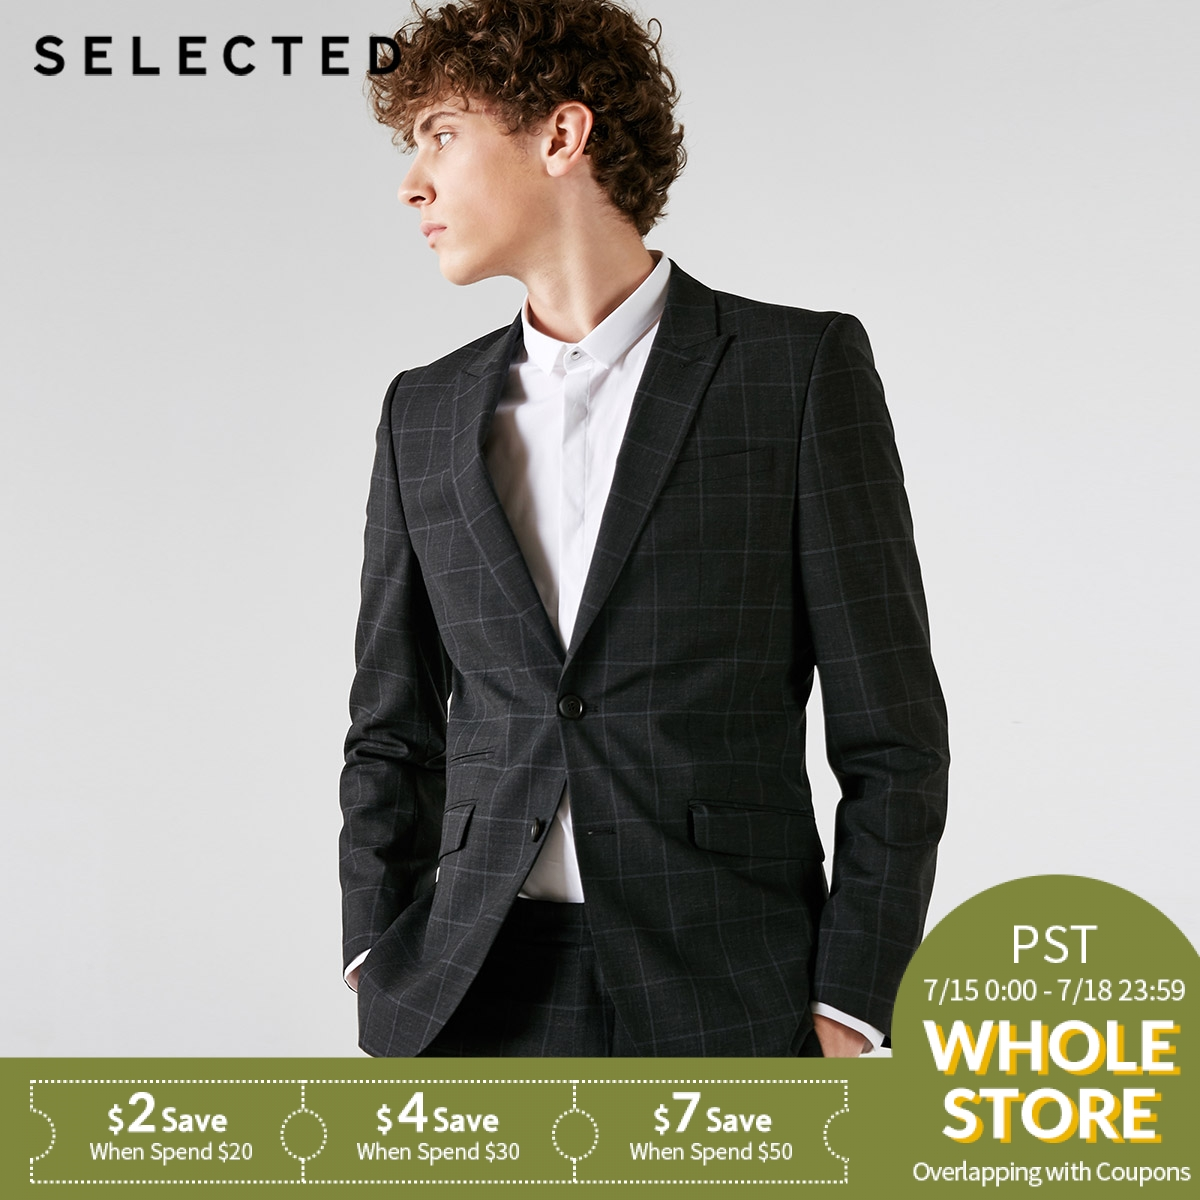 SELECTED Blackrock's New Men Containing Plaid Business Suit Blazer Bussiness Clothes T   41835Y501